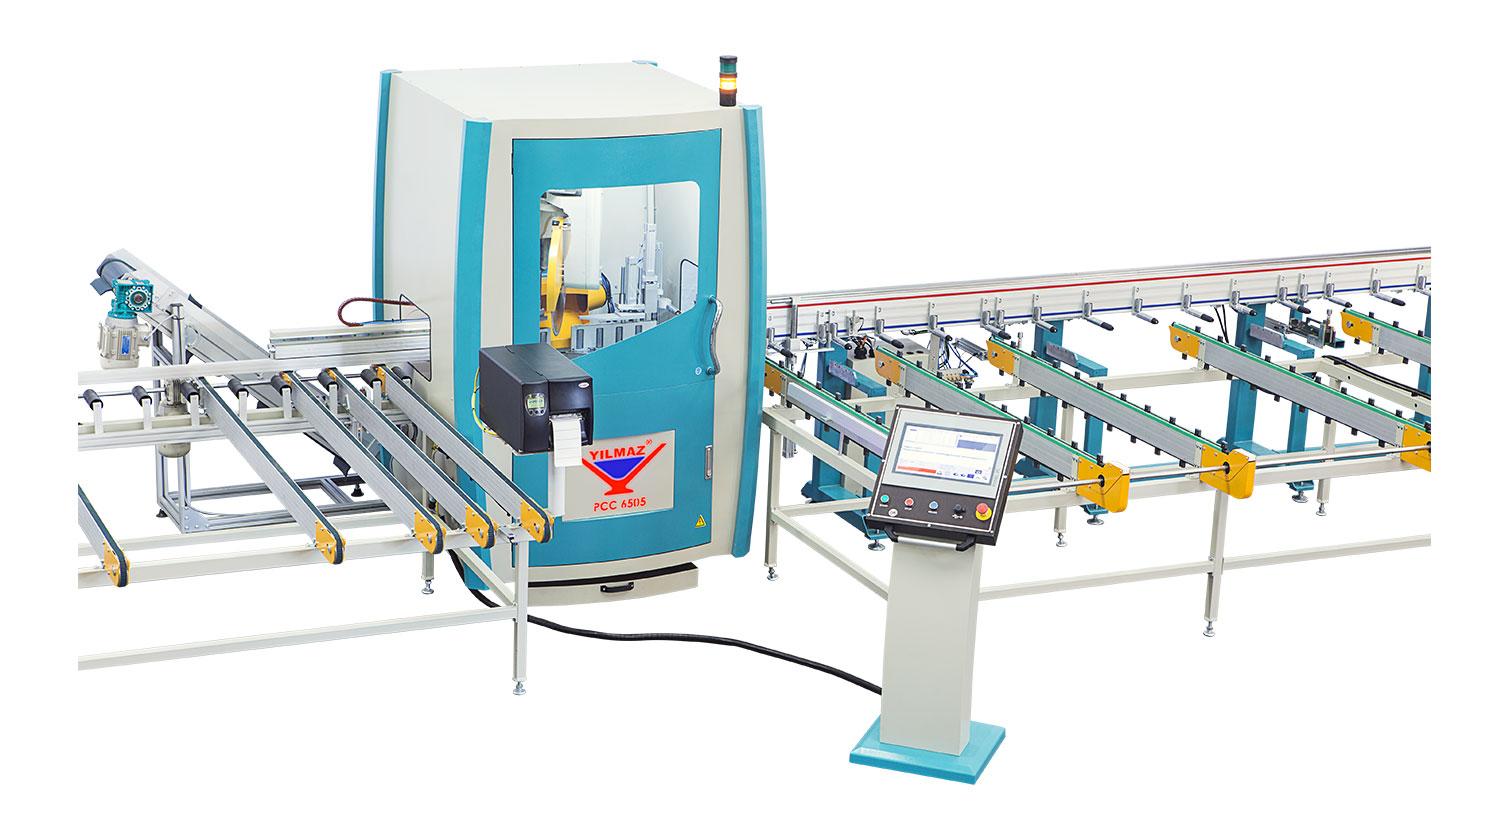 INT pvc cutting centre Yilmaz PCC 6505 cutting unit enclosure